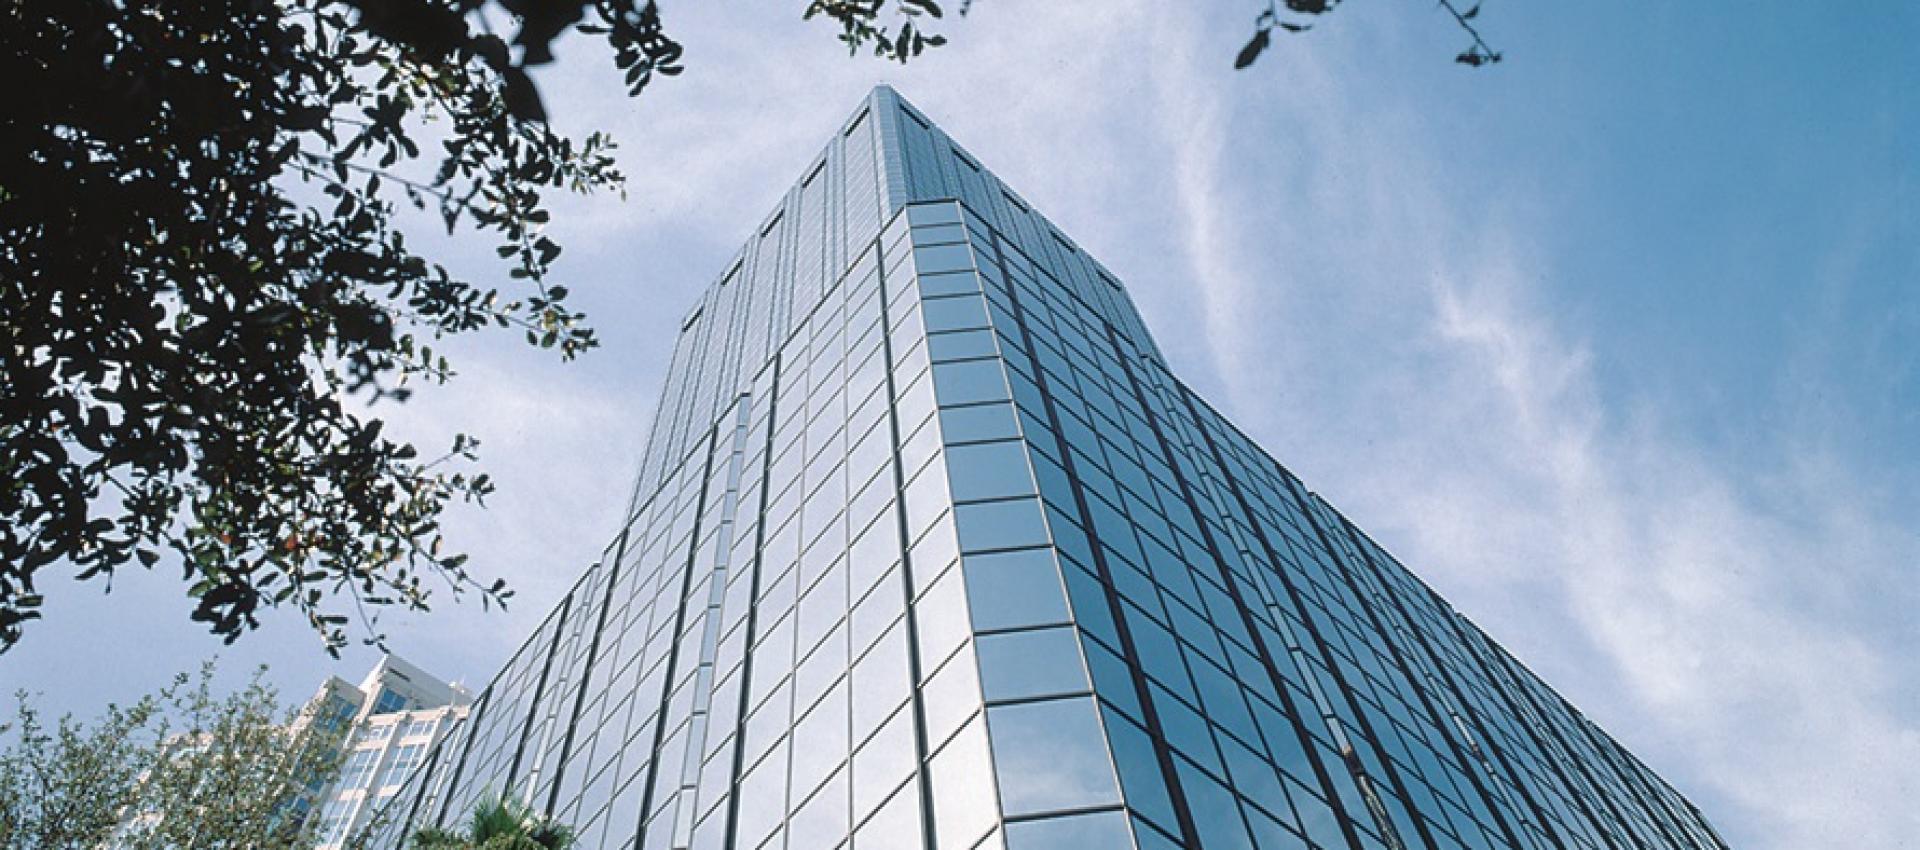 Irodai hővédelem ablakfóliával